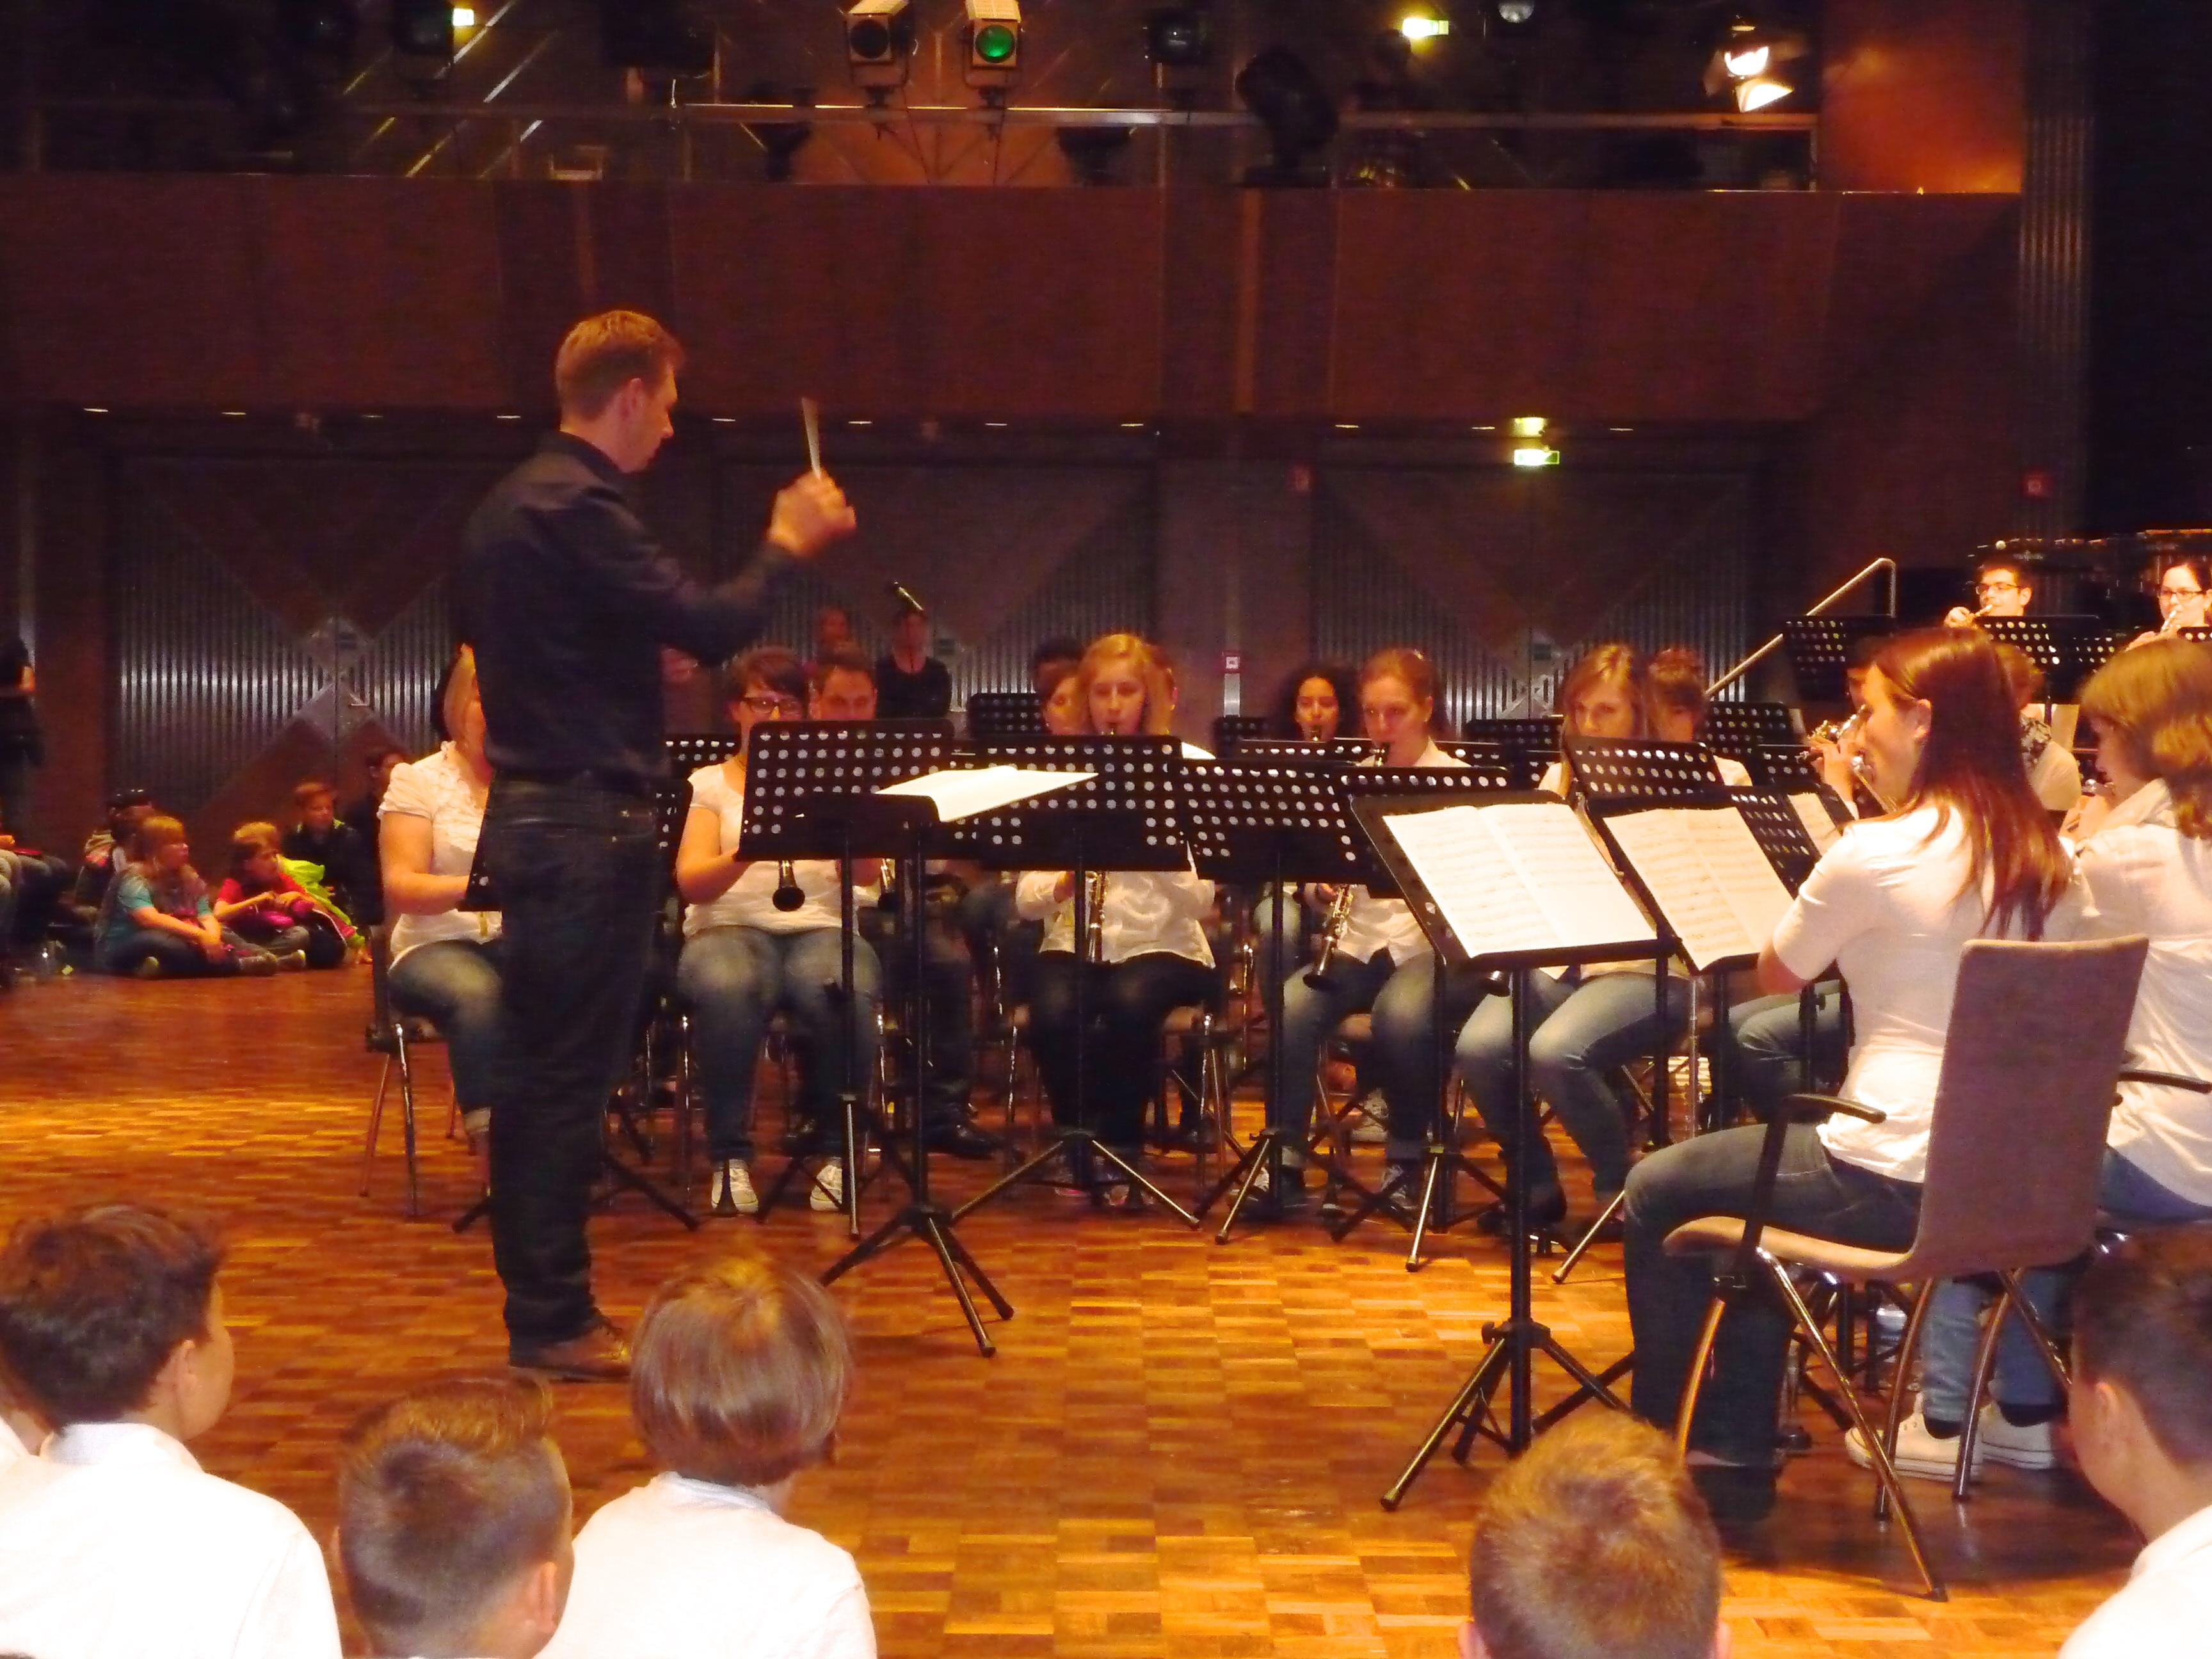 Musikfest Baden-Württemberg 2015 in Karlsruhe